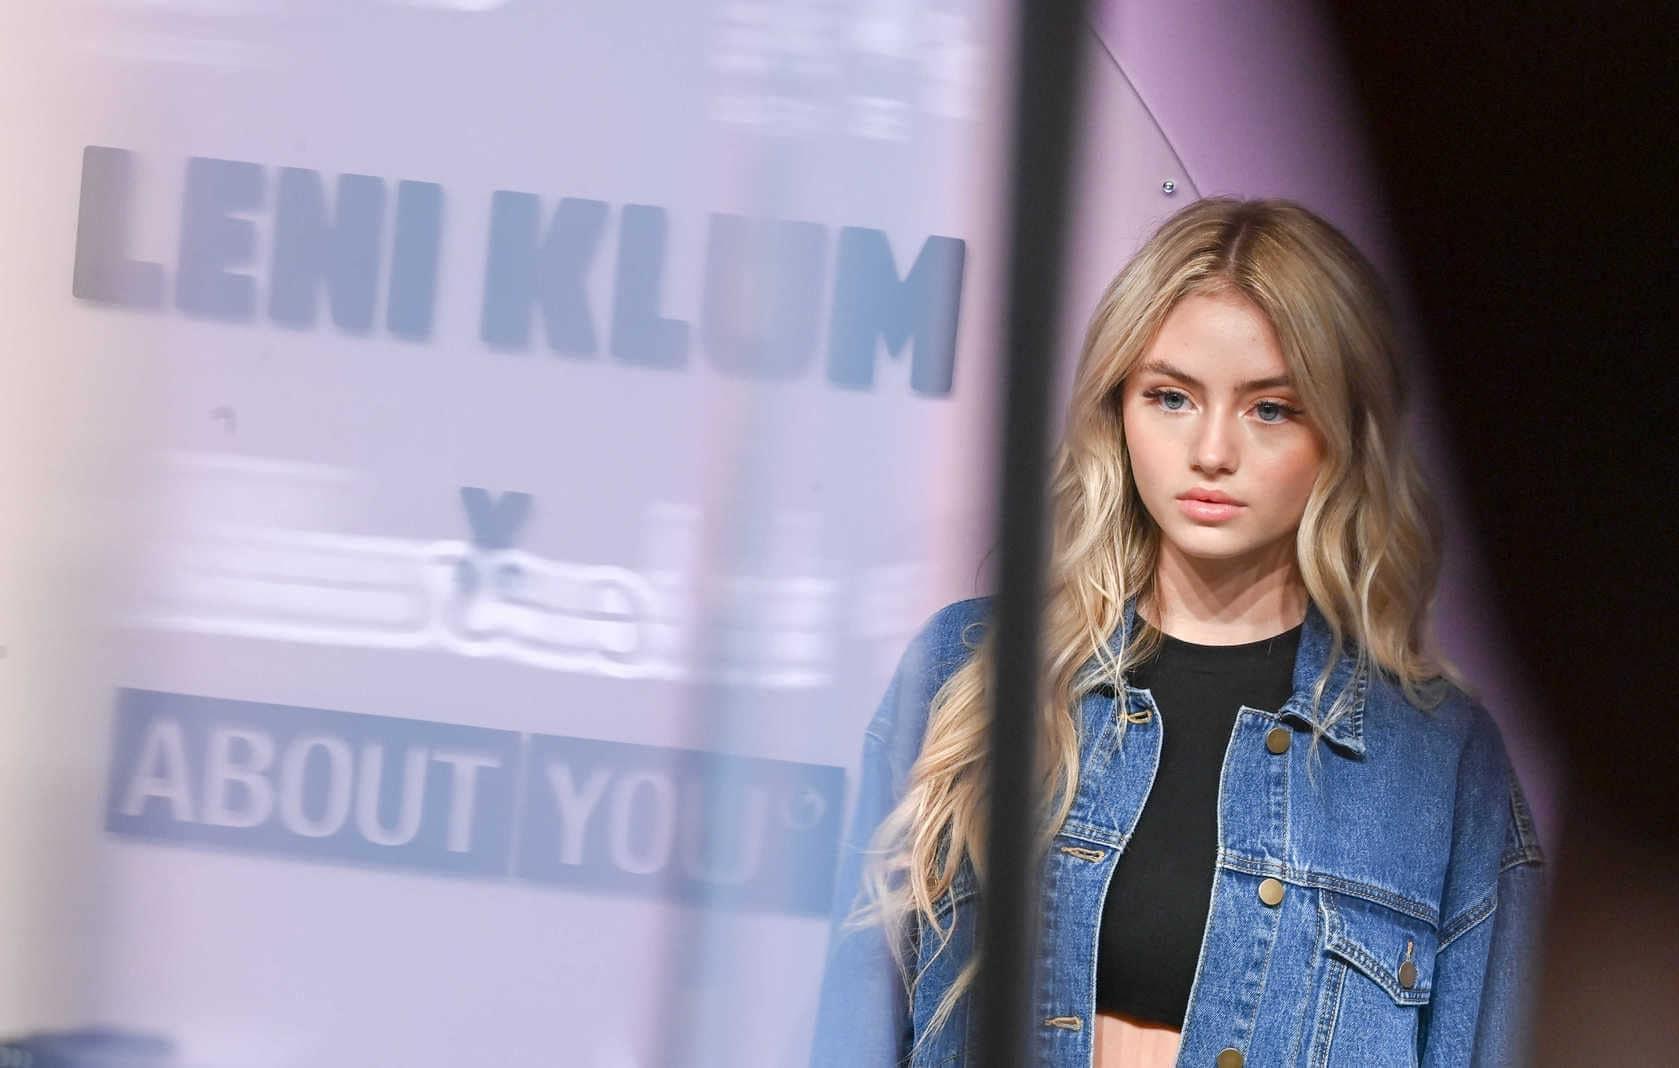 Berliner Modewoche - Leni Klum About You für BS